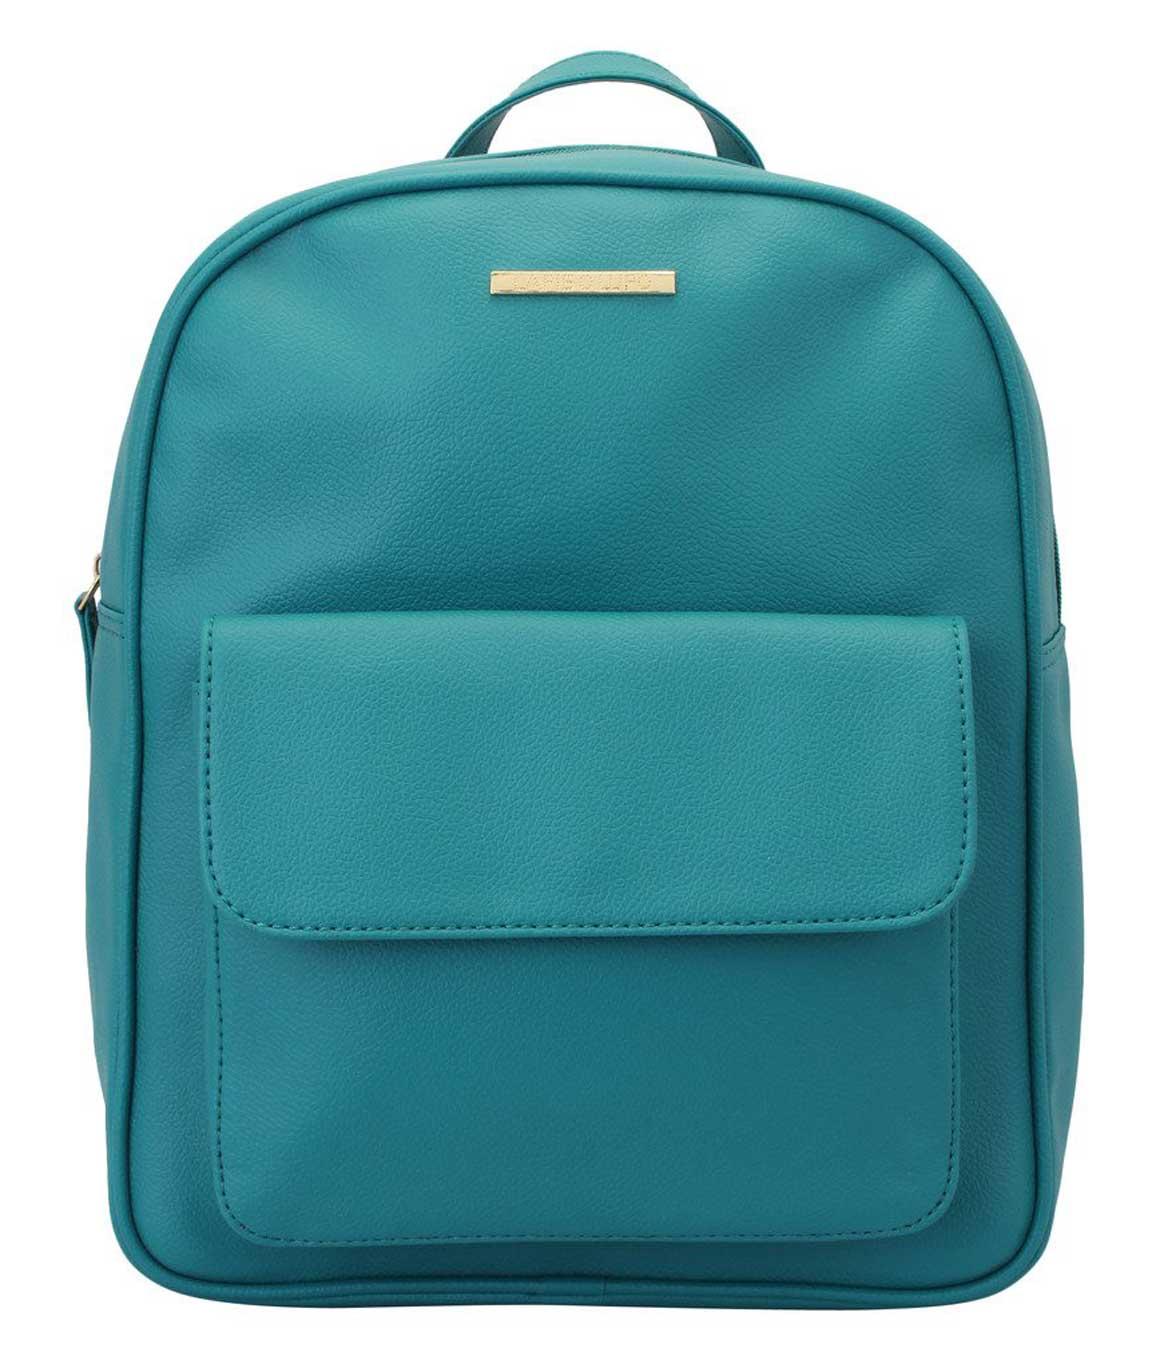 Lapis O Lupo Beryl PU Women`s Backpack(Turquoise)